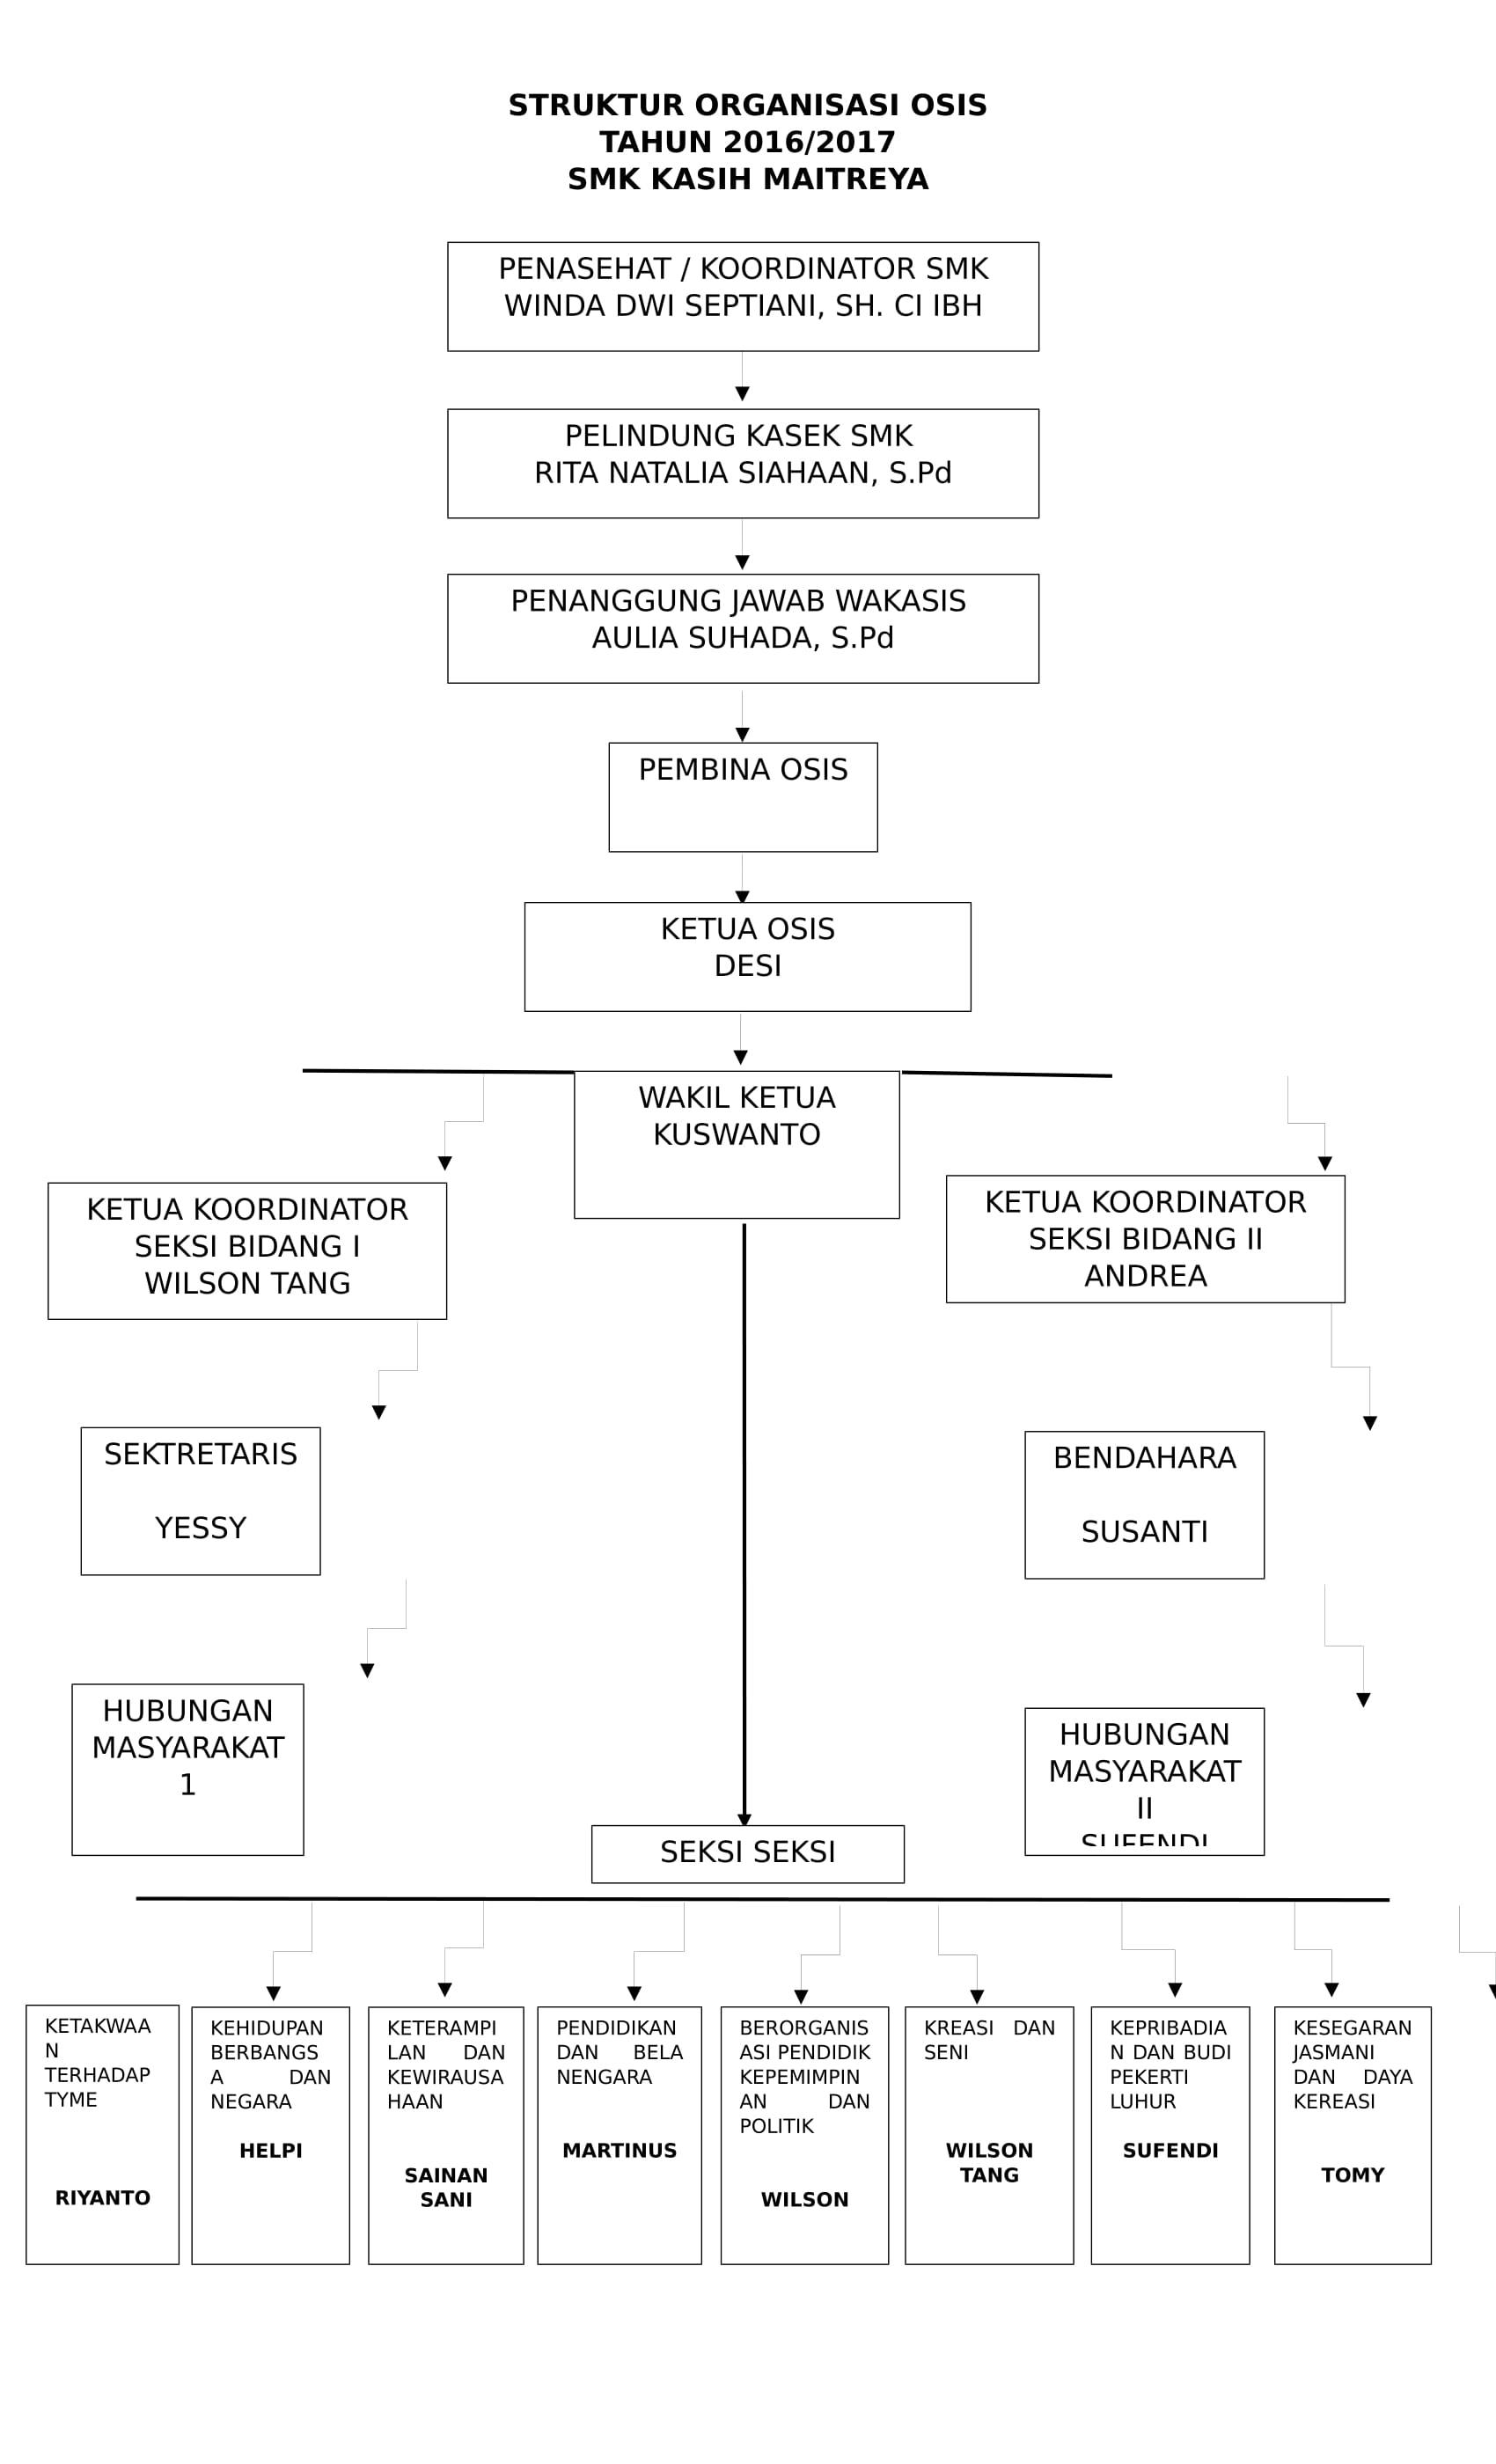 Struktur Organisasi OSIS